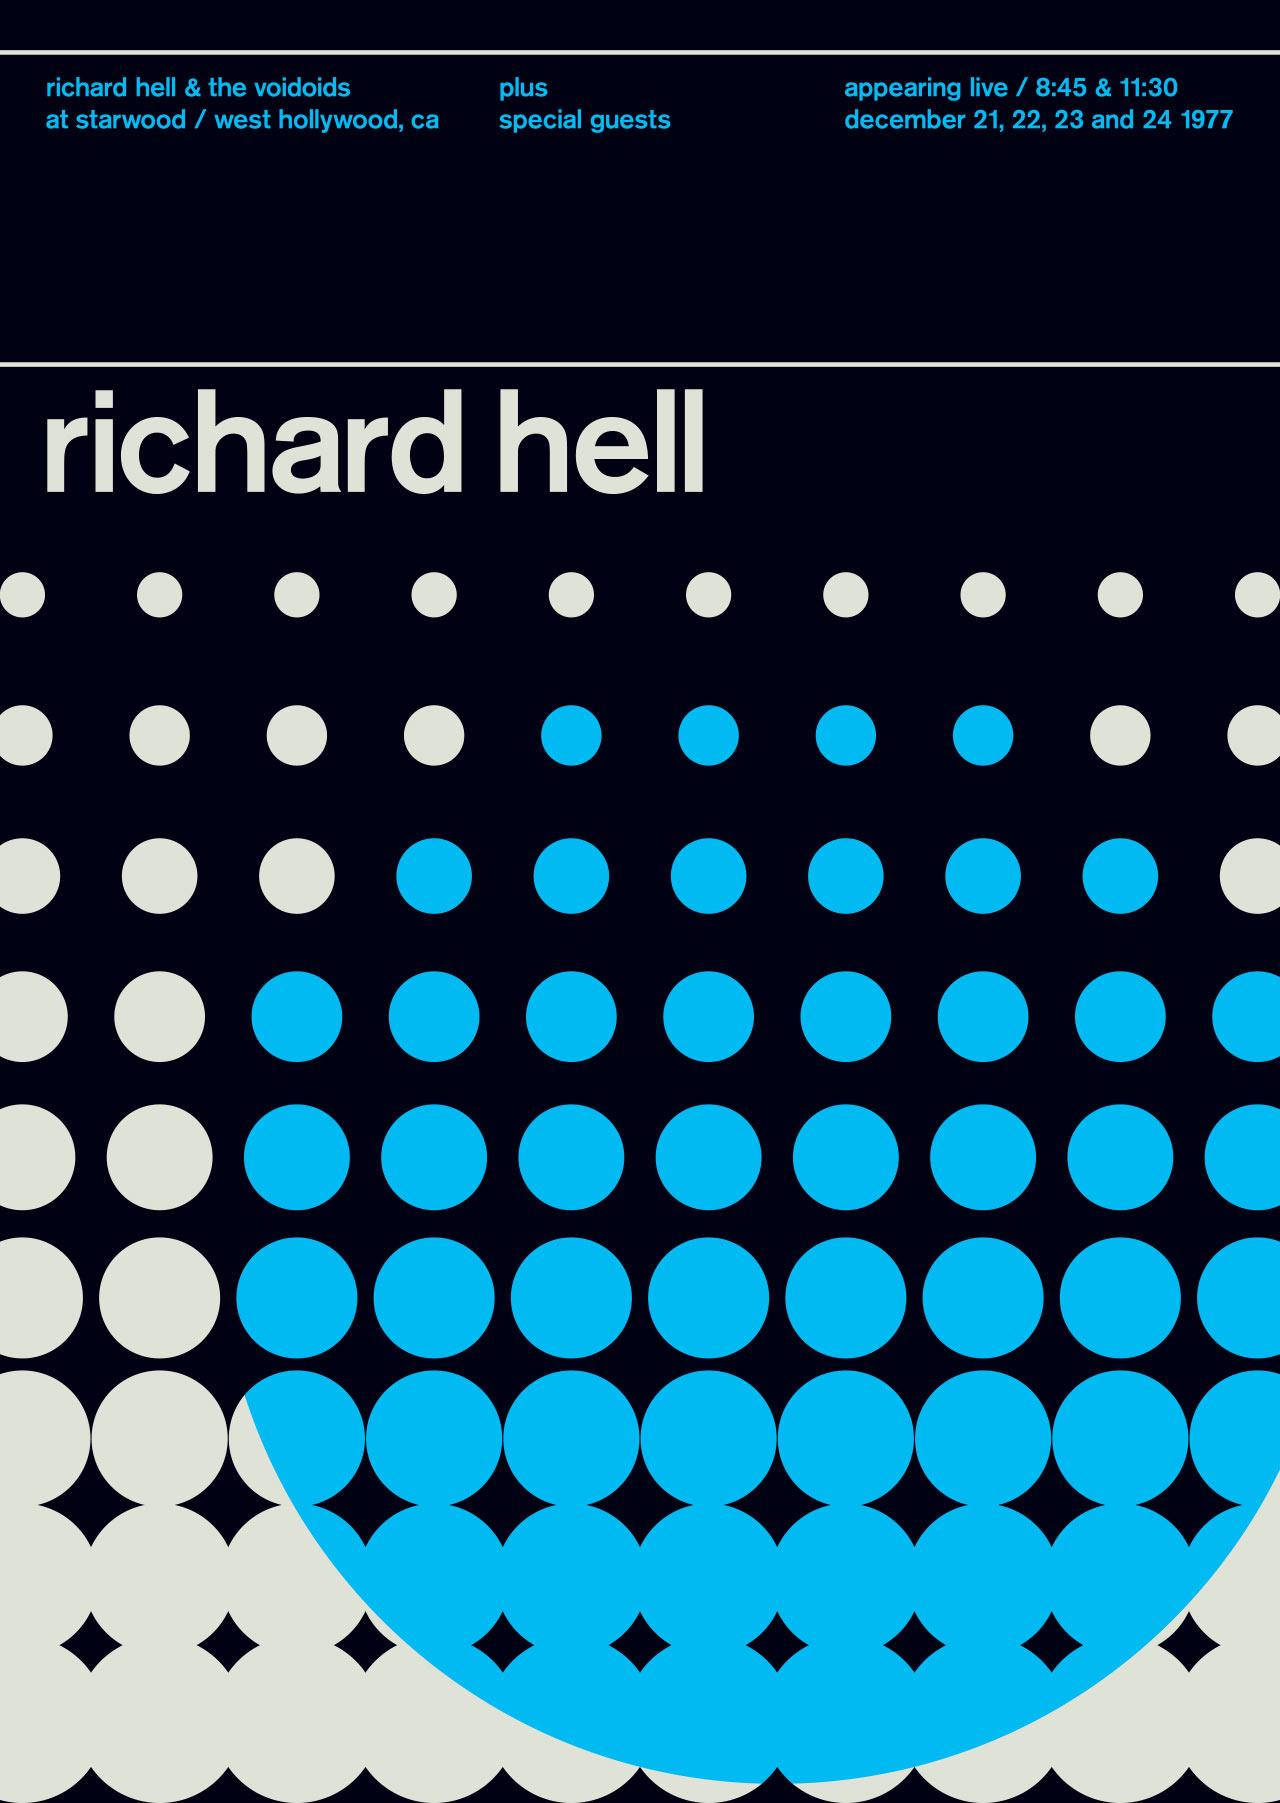 Swissted-Legends_Posters-16-richard_hell_legends_series